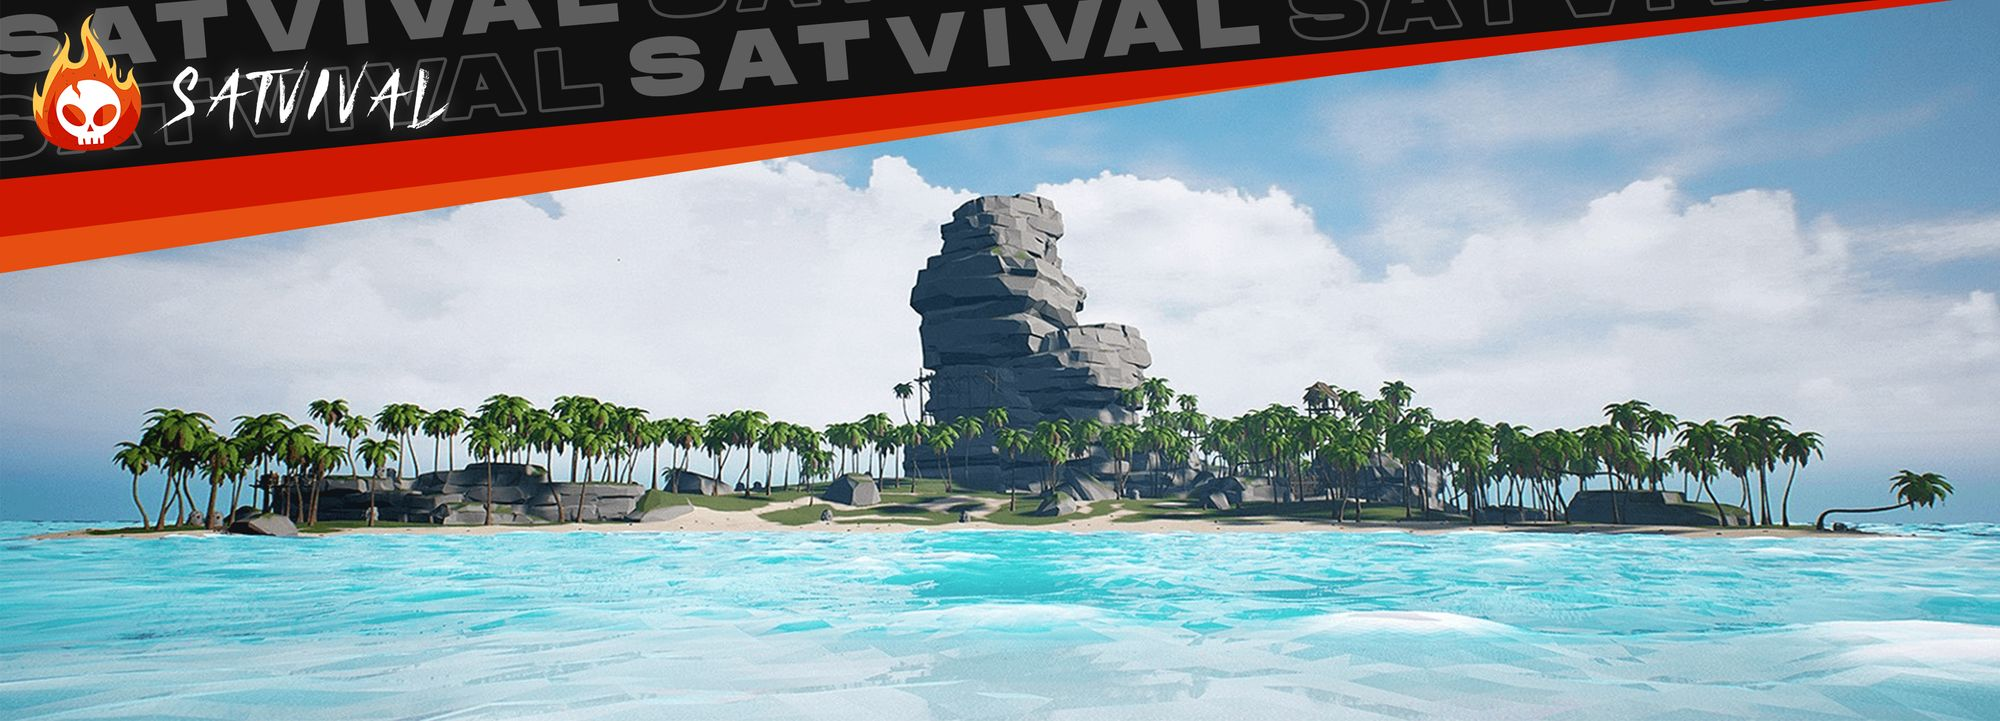 Satvival - Map